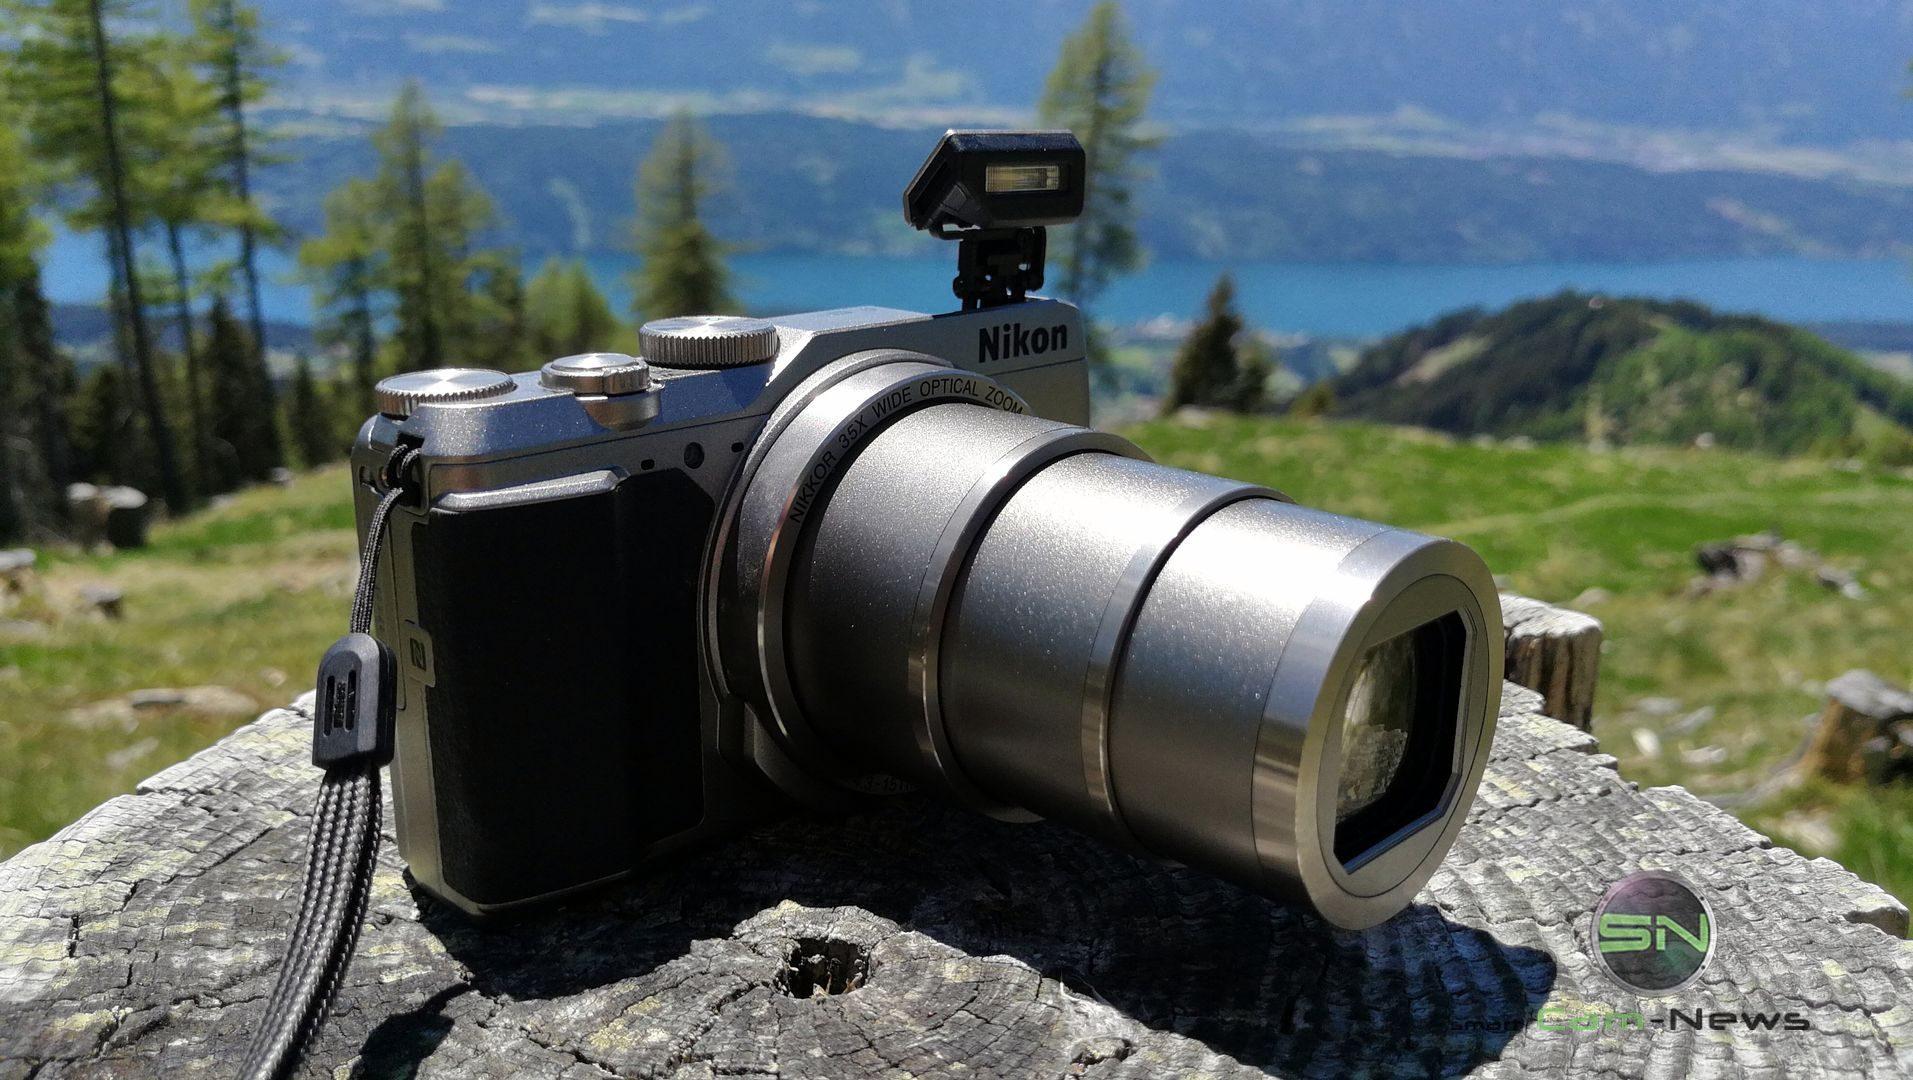 980mm Zoom 35fach - Nikon Coolpix A900 MegaZoom - Millstättersee - SmartCamNews